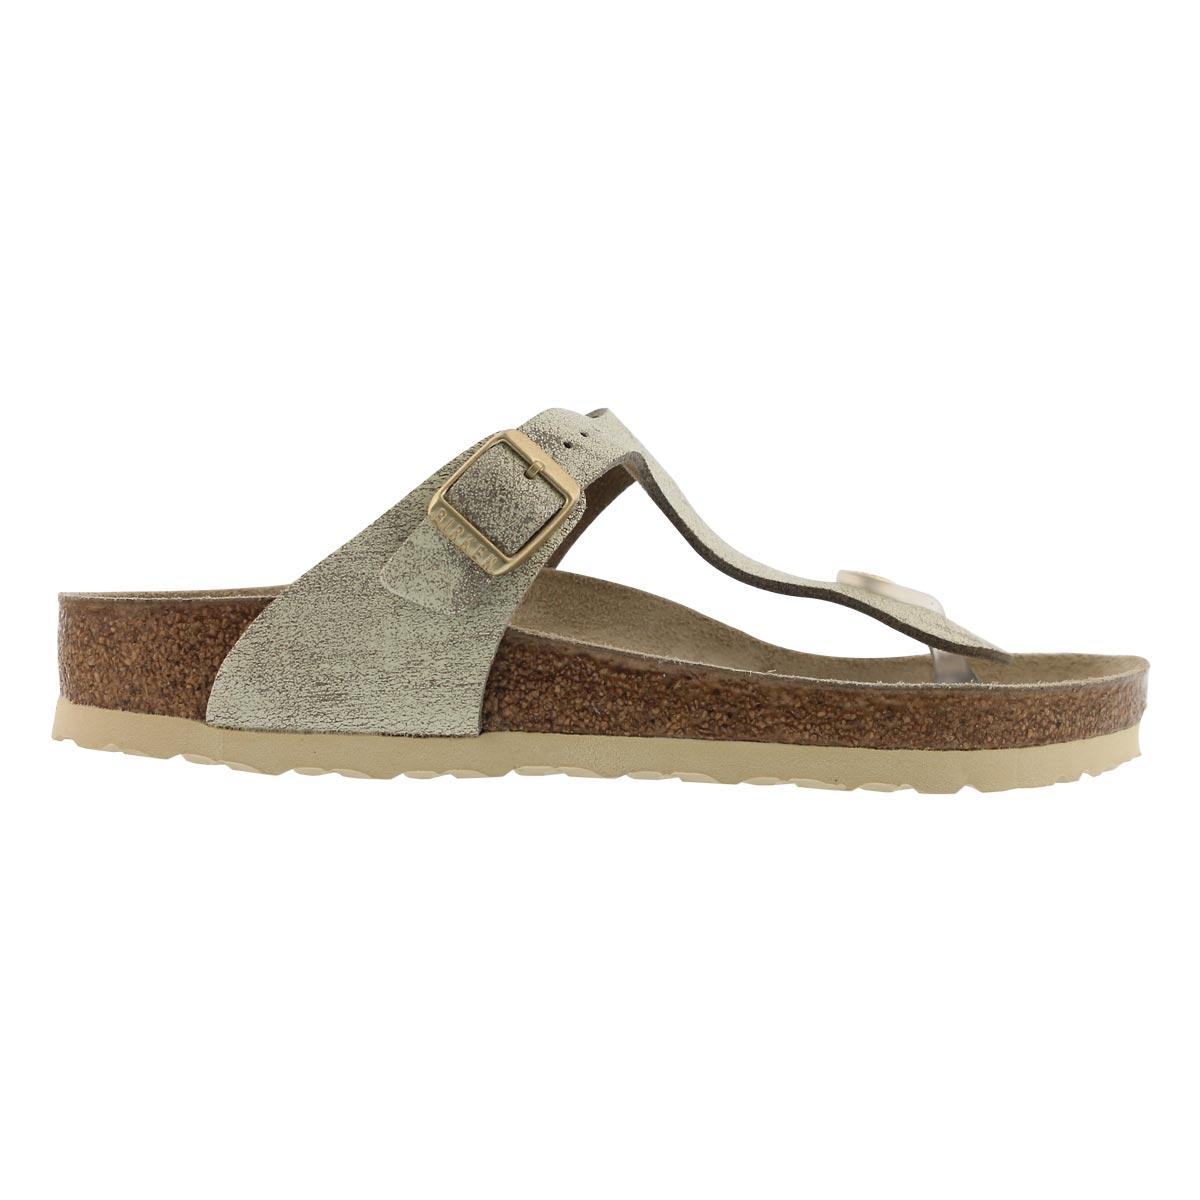 Lds Gizeh LTR wshd mtlc crm gld sandal